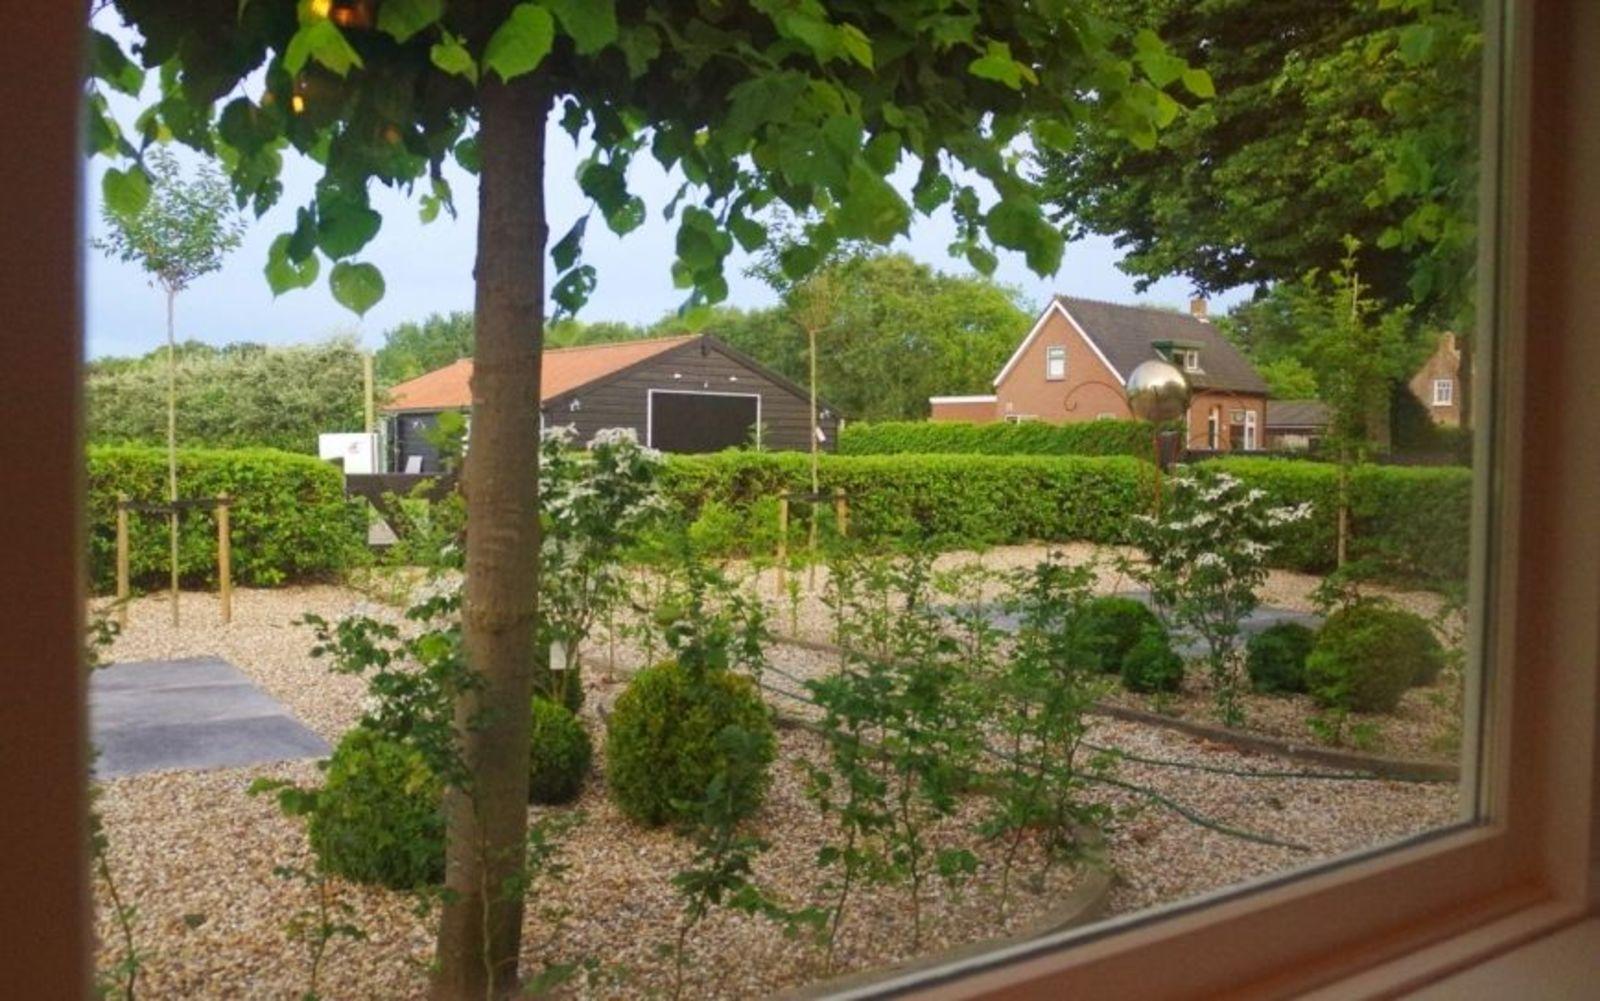 Vacation home Dijkstelweg 30 (4 persons) - Ouddorp